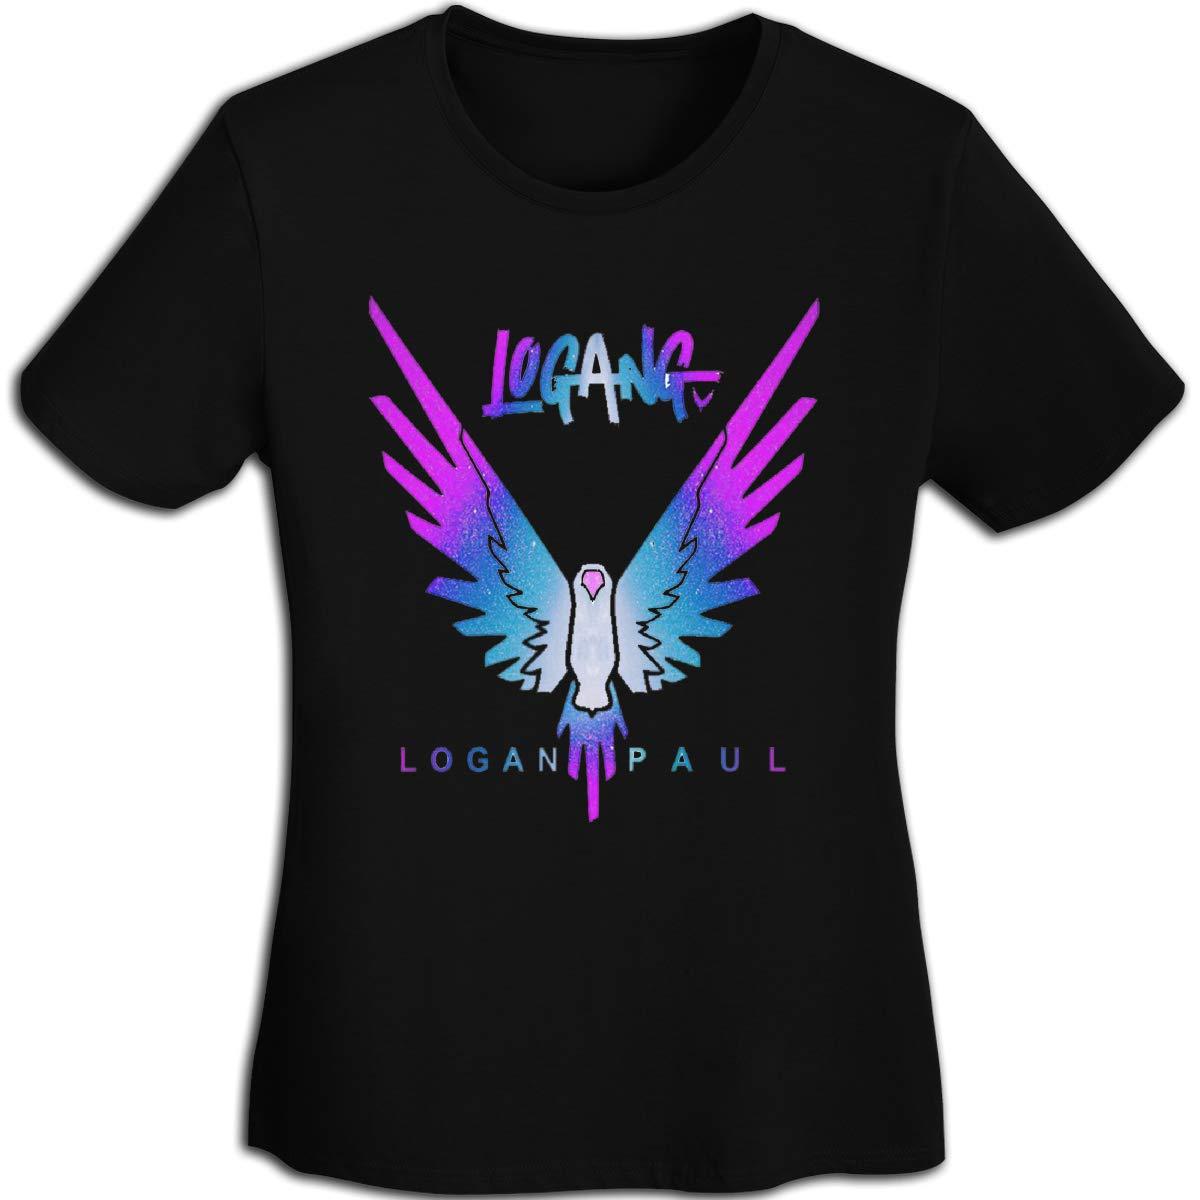 Women's T Shirt Jake Paul Logang Logan Paul Maverick Tee Shirts T-Shirt Short-Sleeve Round Neck Tshirt for Womens Girls Black L by BKashy